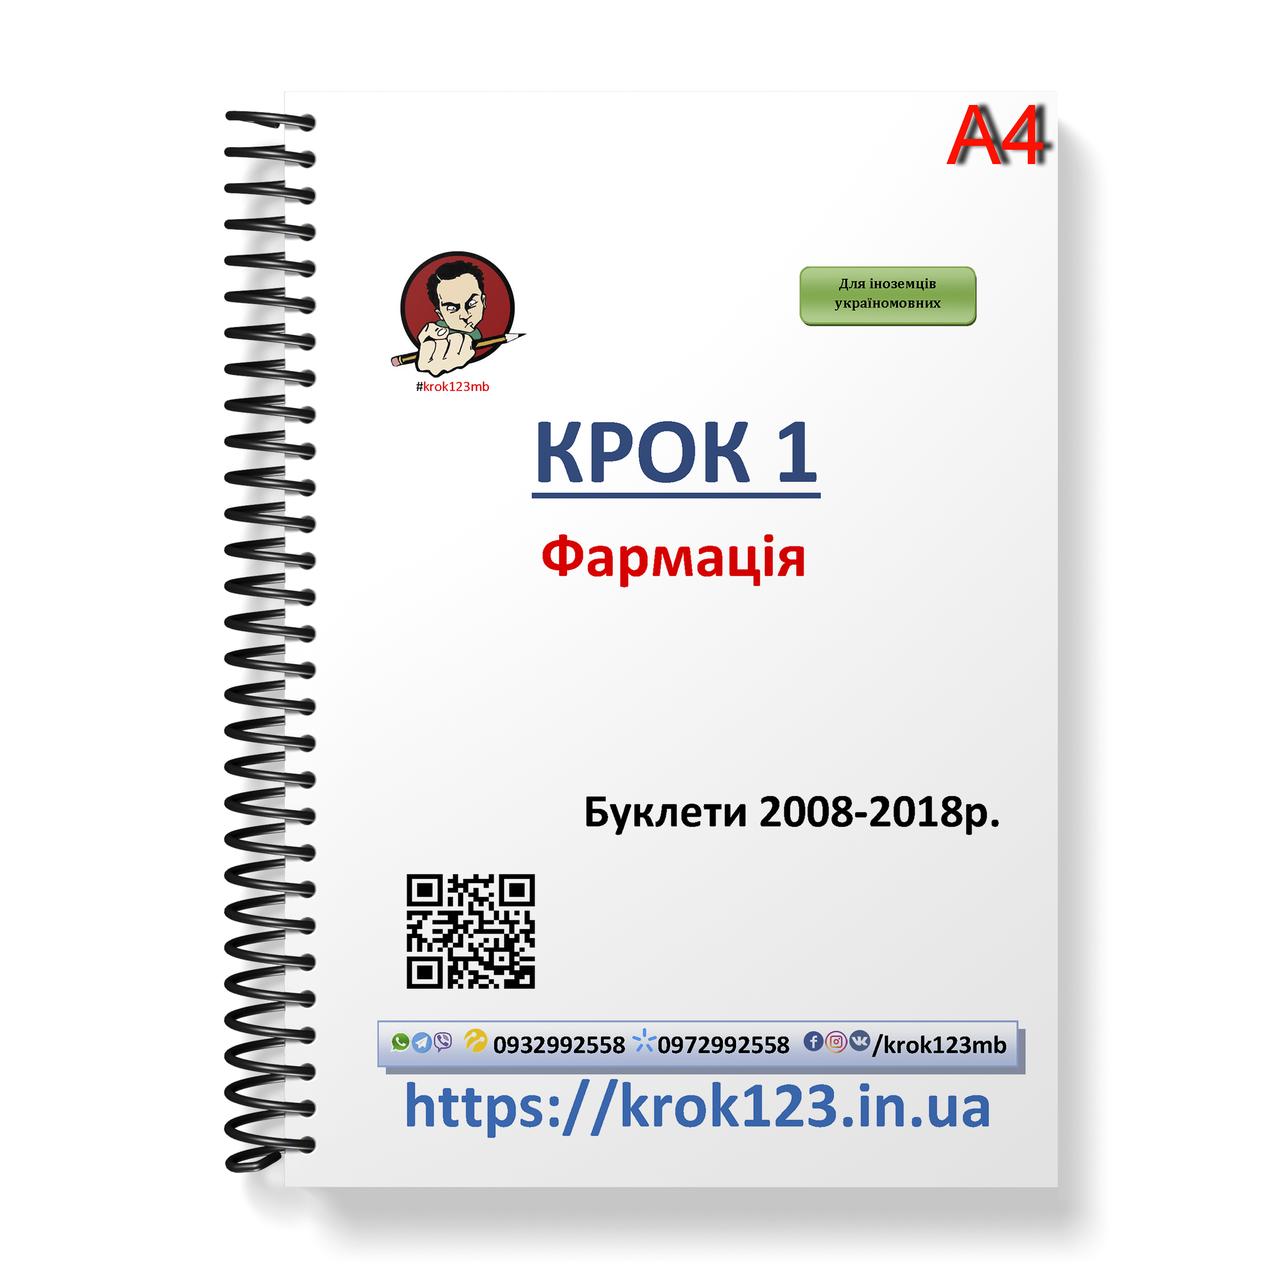 Крок 1. Фармация. Буклеты 2008-2018 . Для иностранцев украиноязычных. Формат А4